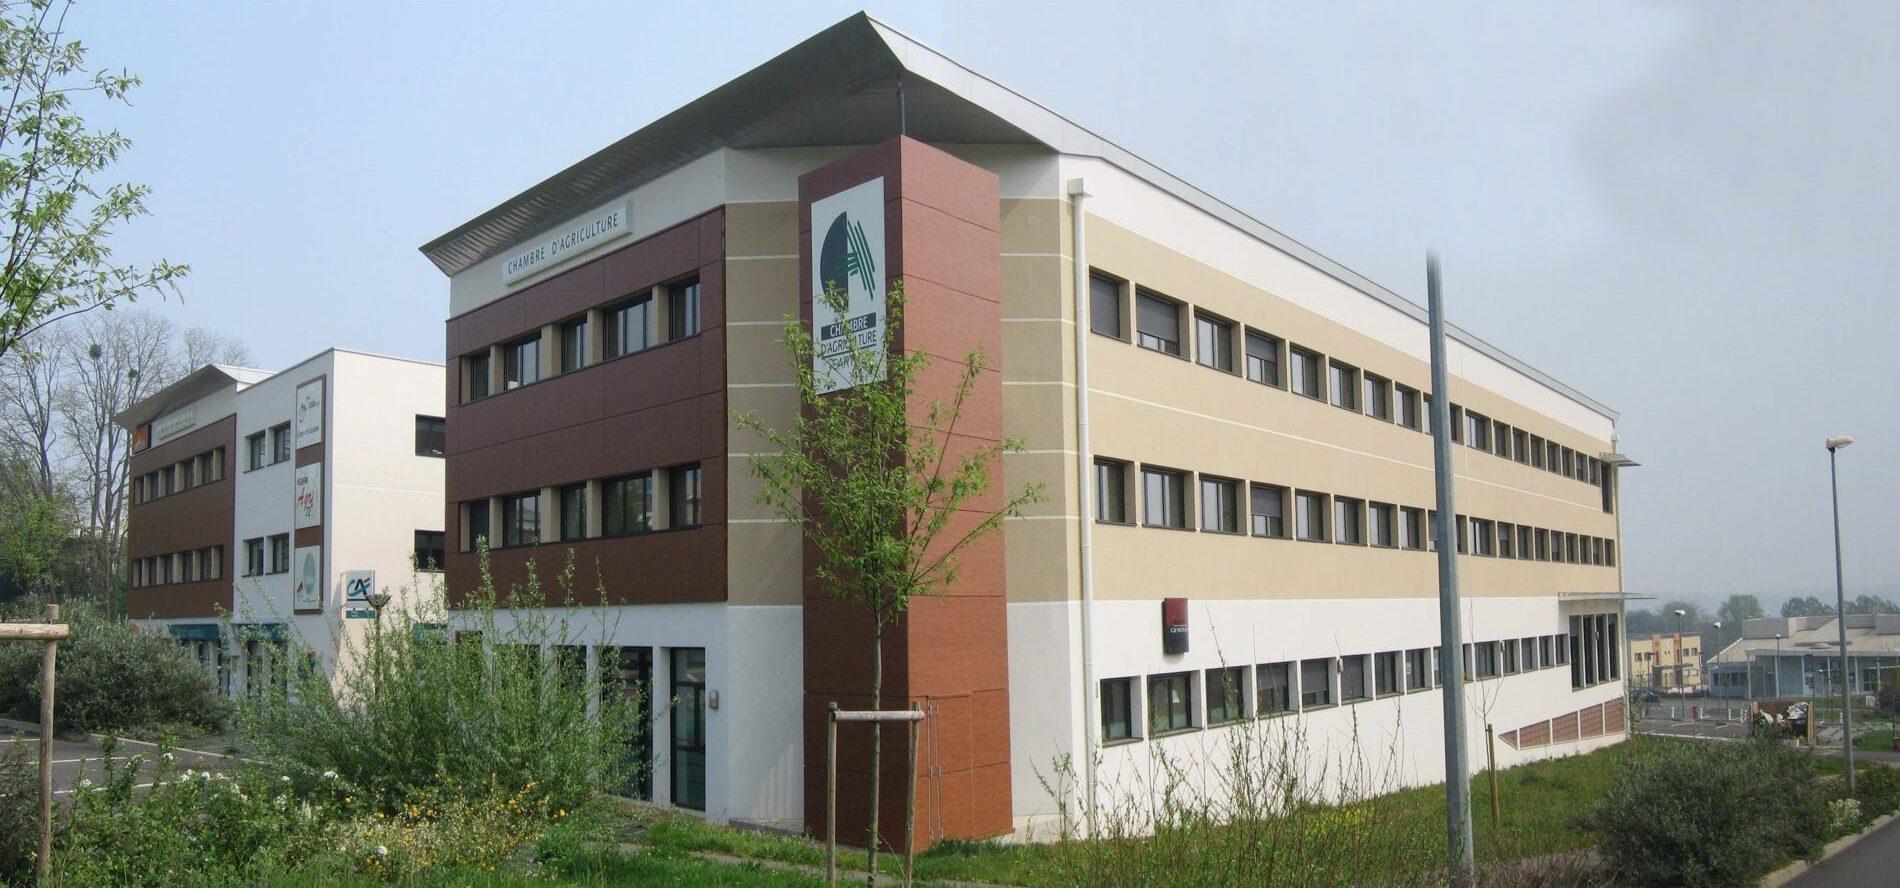 ACAU Chambre d'Agriculture de la Sarthe vue 1